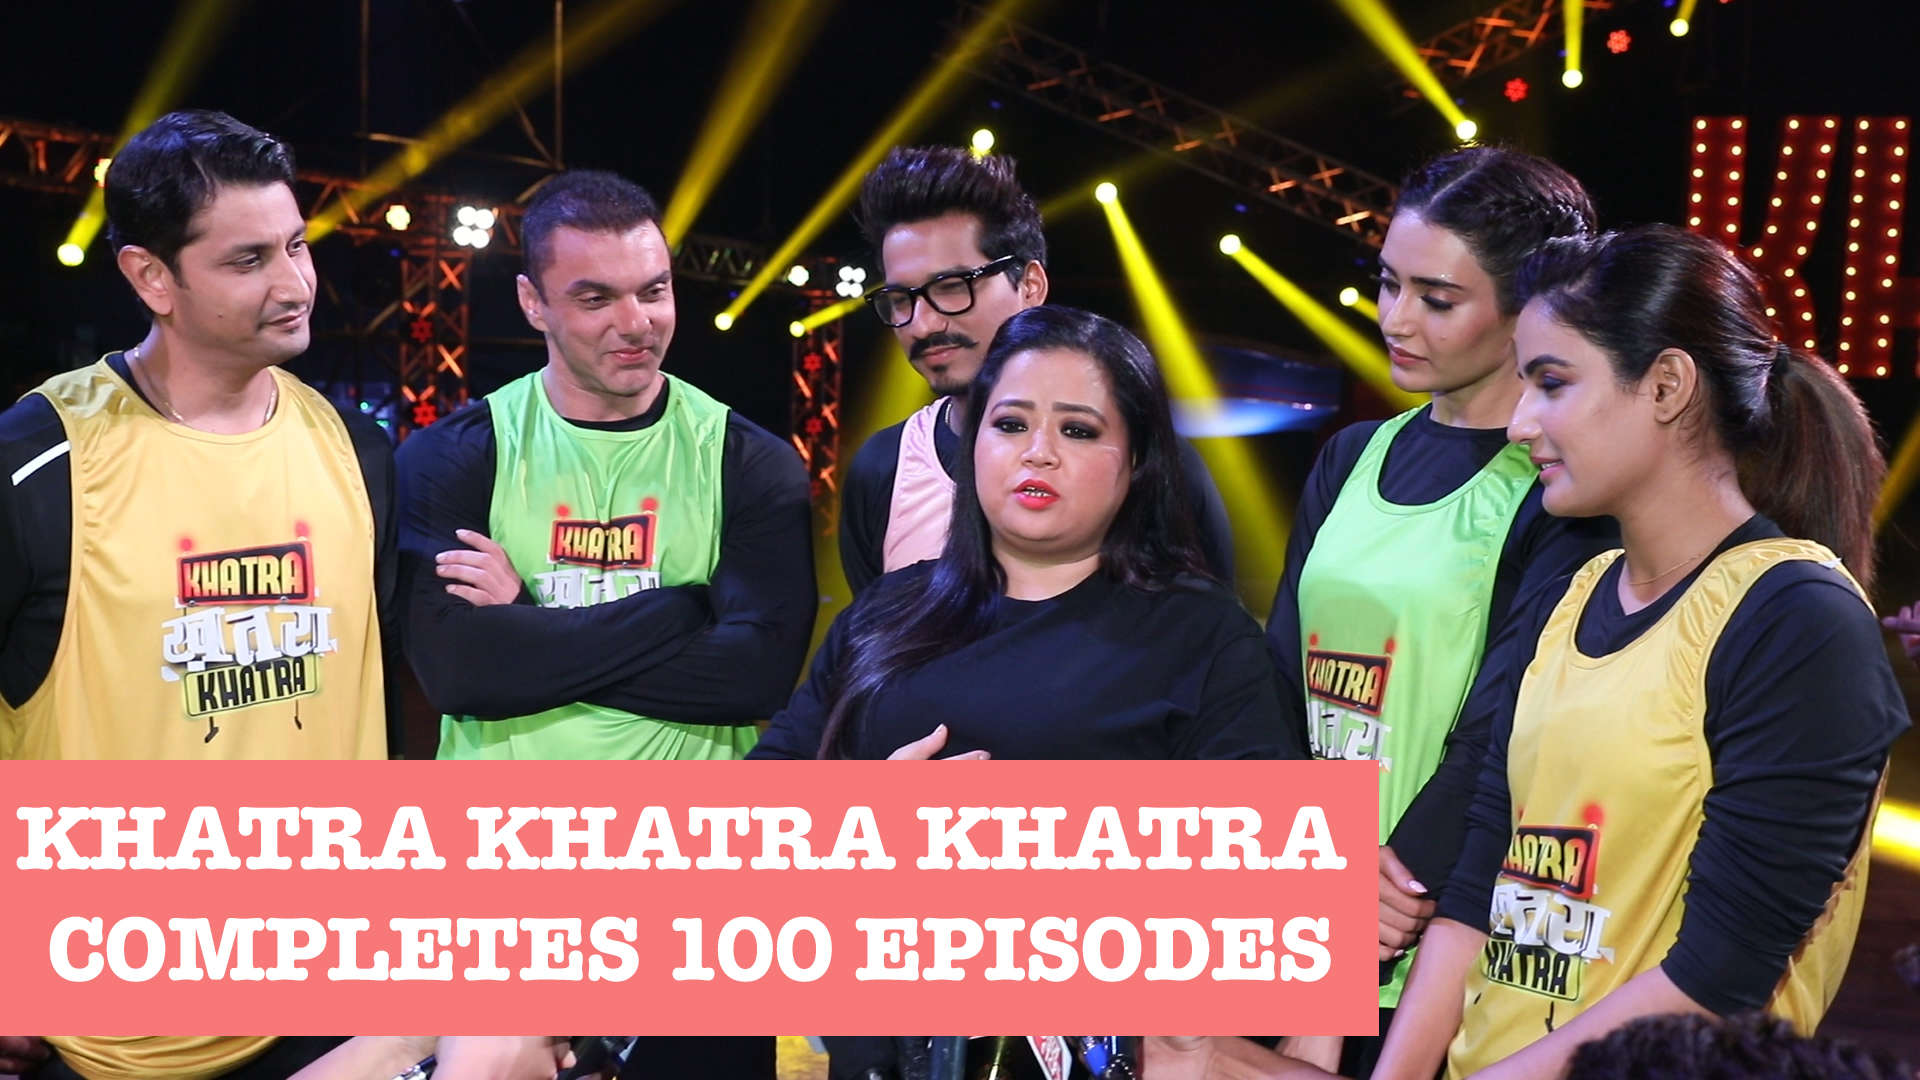 Khatra Khatra Khatra completes 100 episodes, Bharti Singh, Harsh  Limbachiyaa and others celebrate